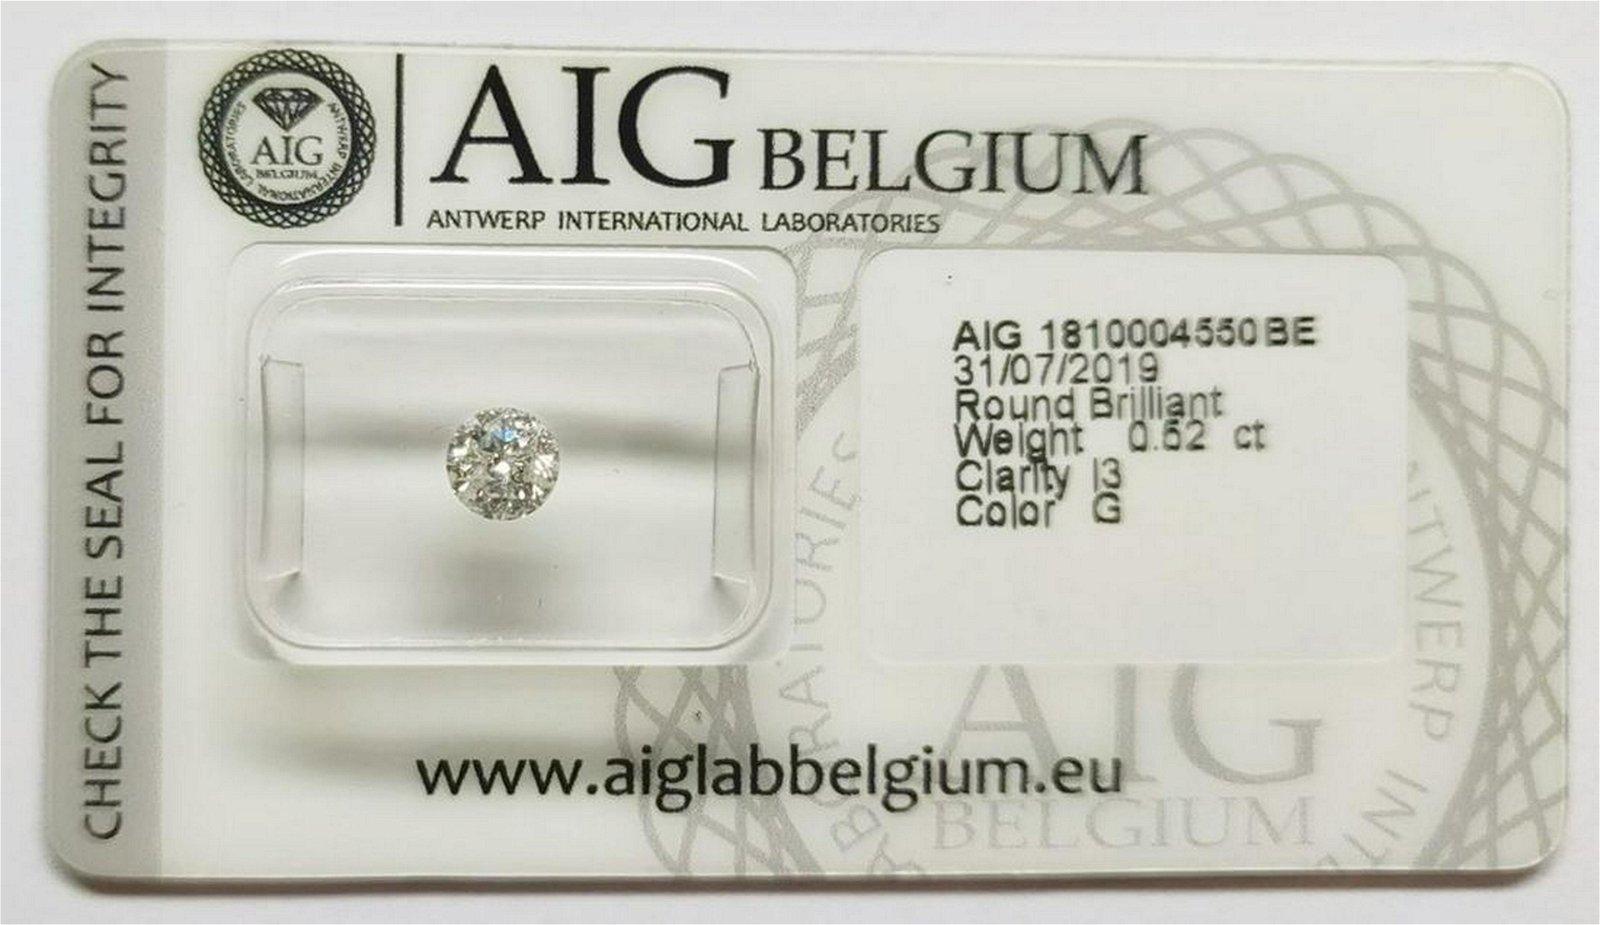 Round Brilliant Diamond total 0.52 ct Color G Clarity